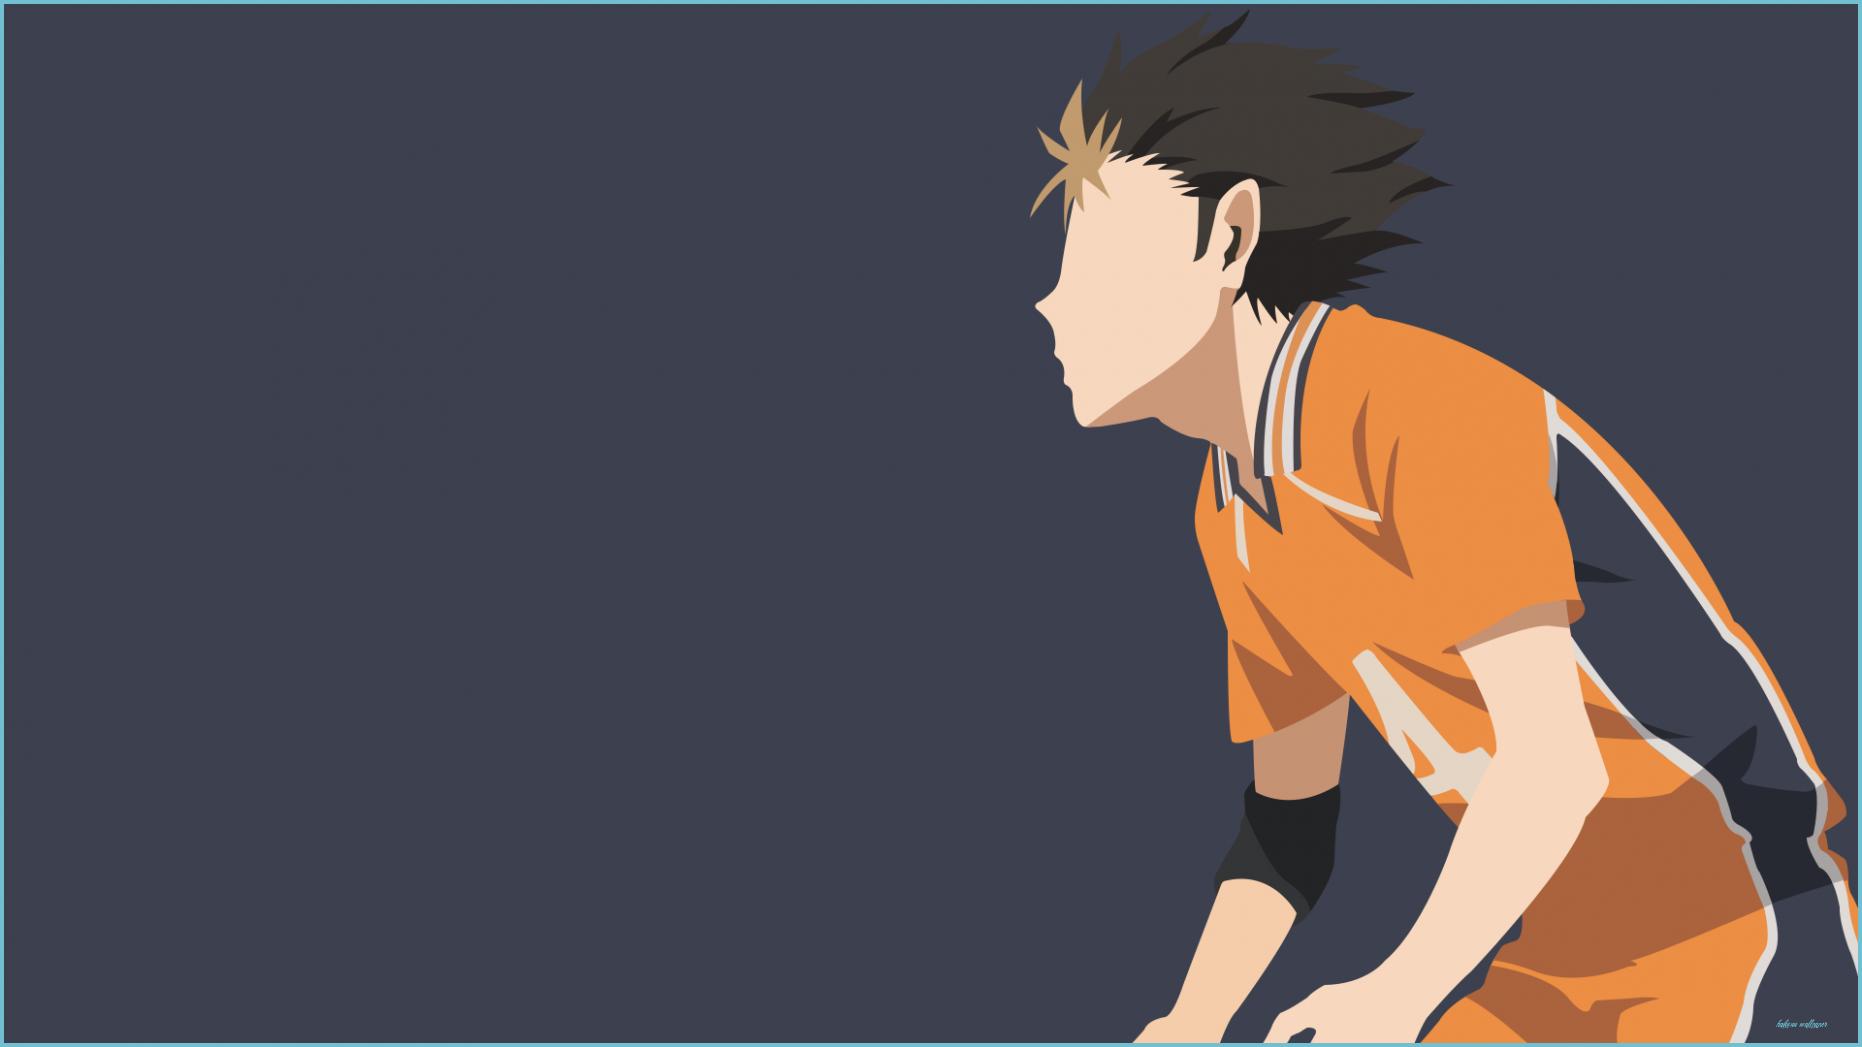 Nishinoya from Haikyuu Wallpaper for Desktop HD Wallpaper 1862x1047